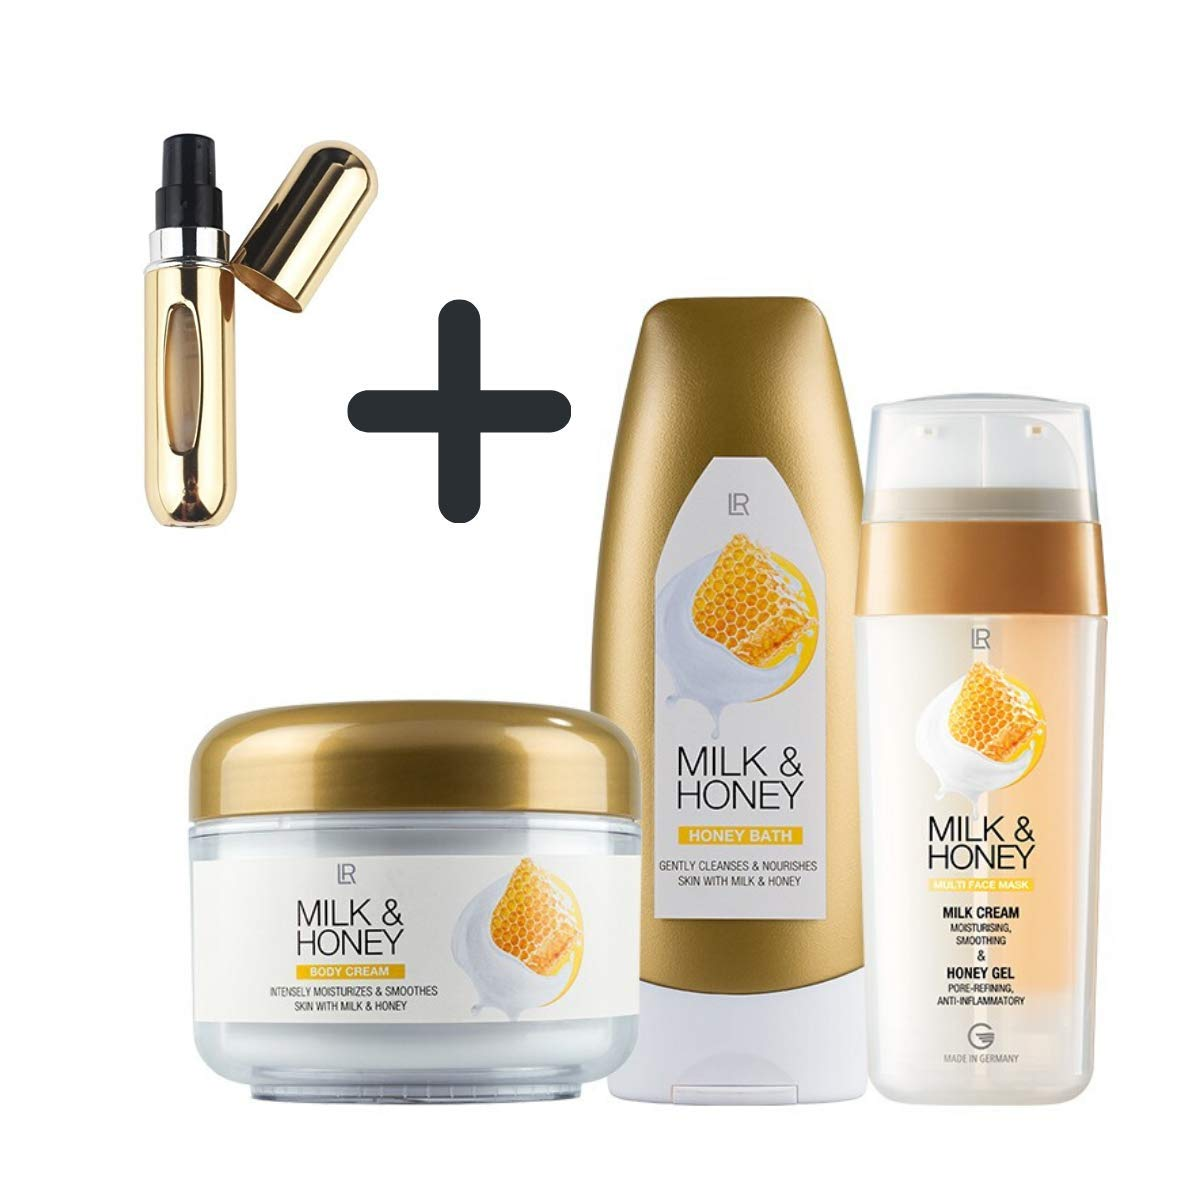 LR Milk & Honey Set limitiert  Amazon.de Beauty